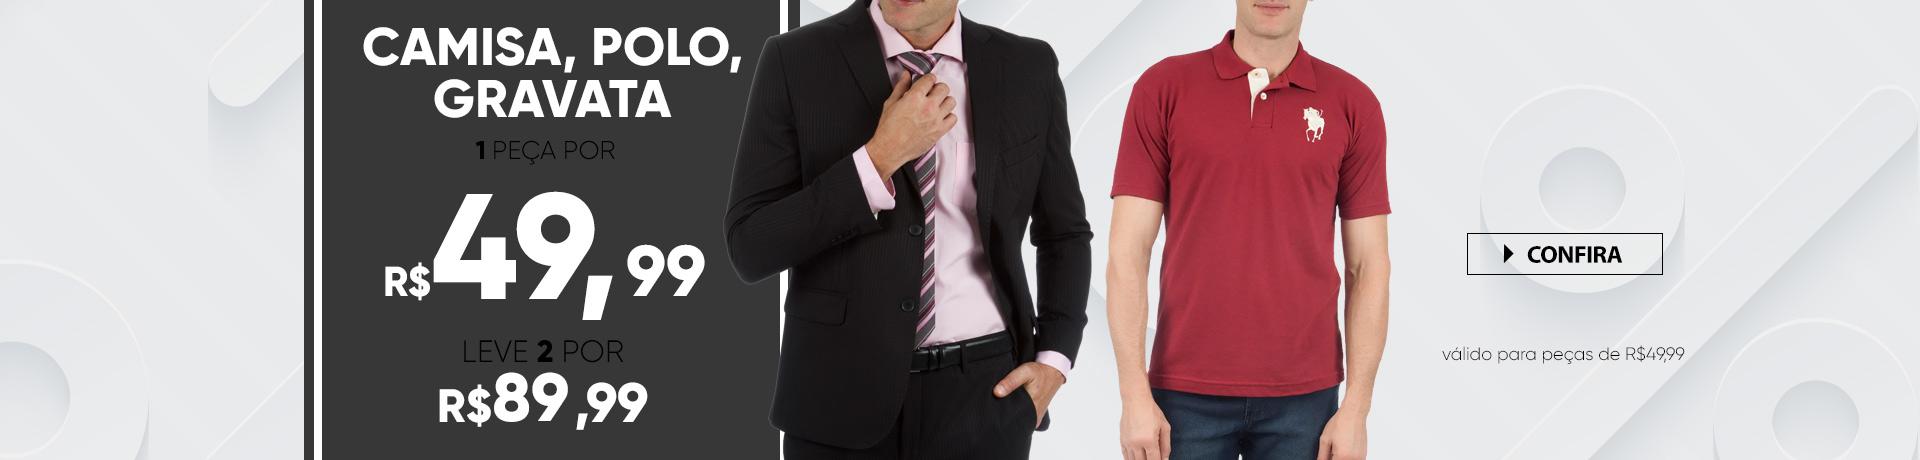 Camisa, Polo, gravata por 89,99